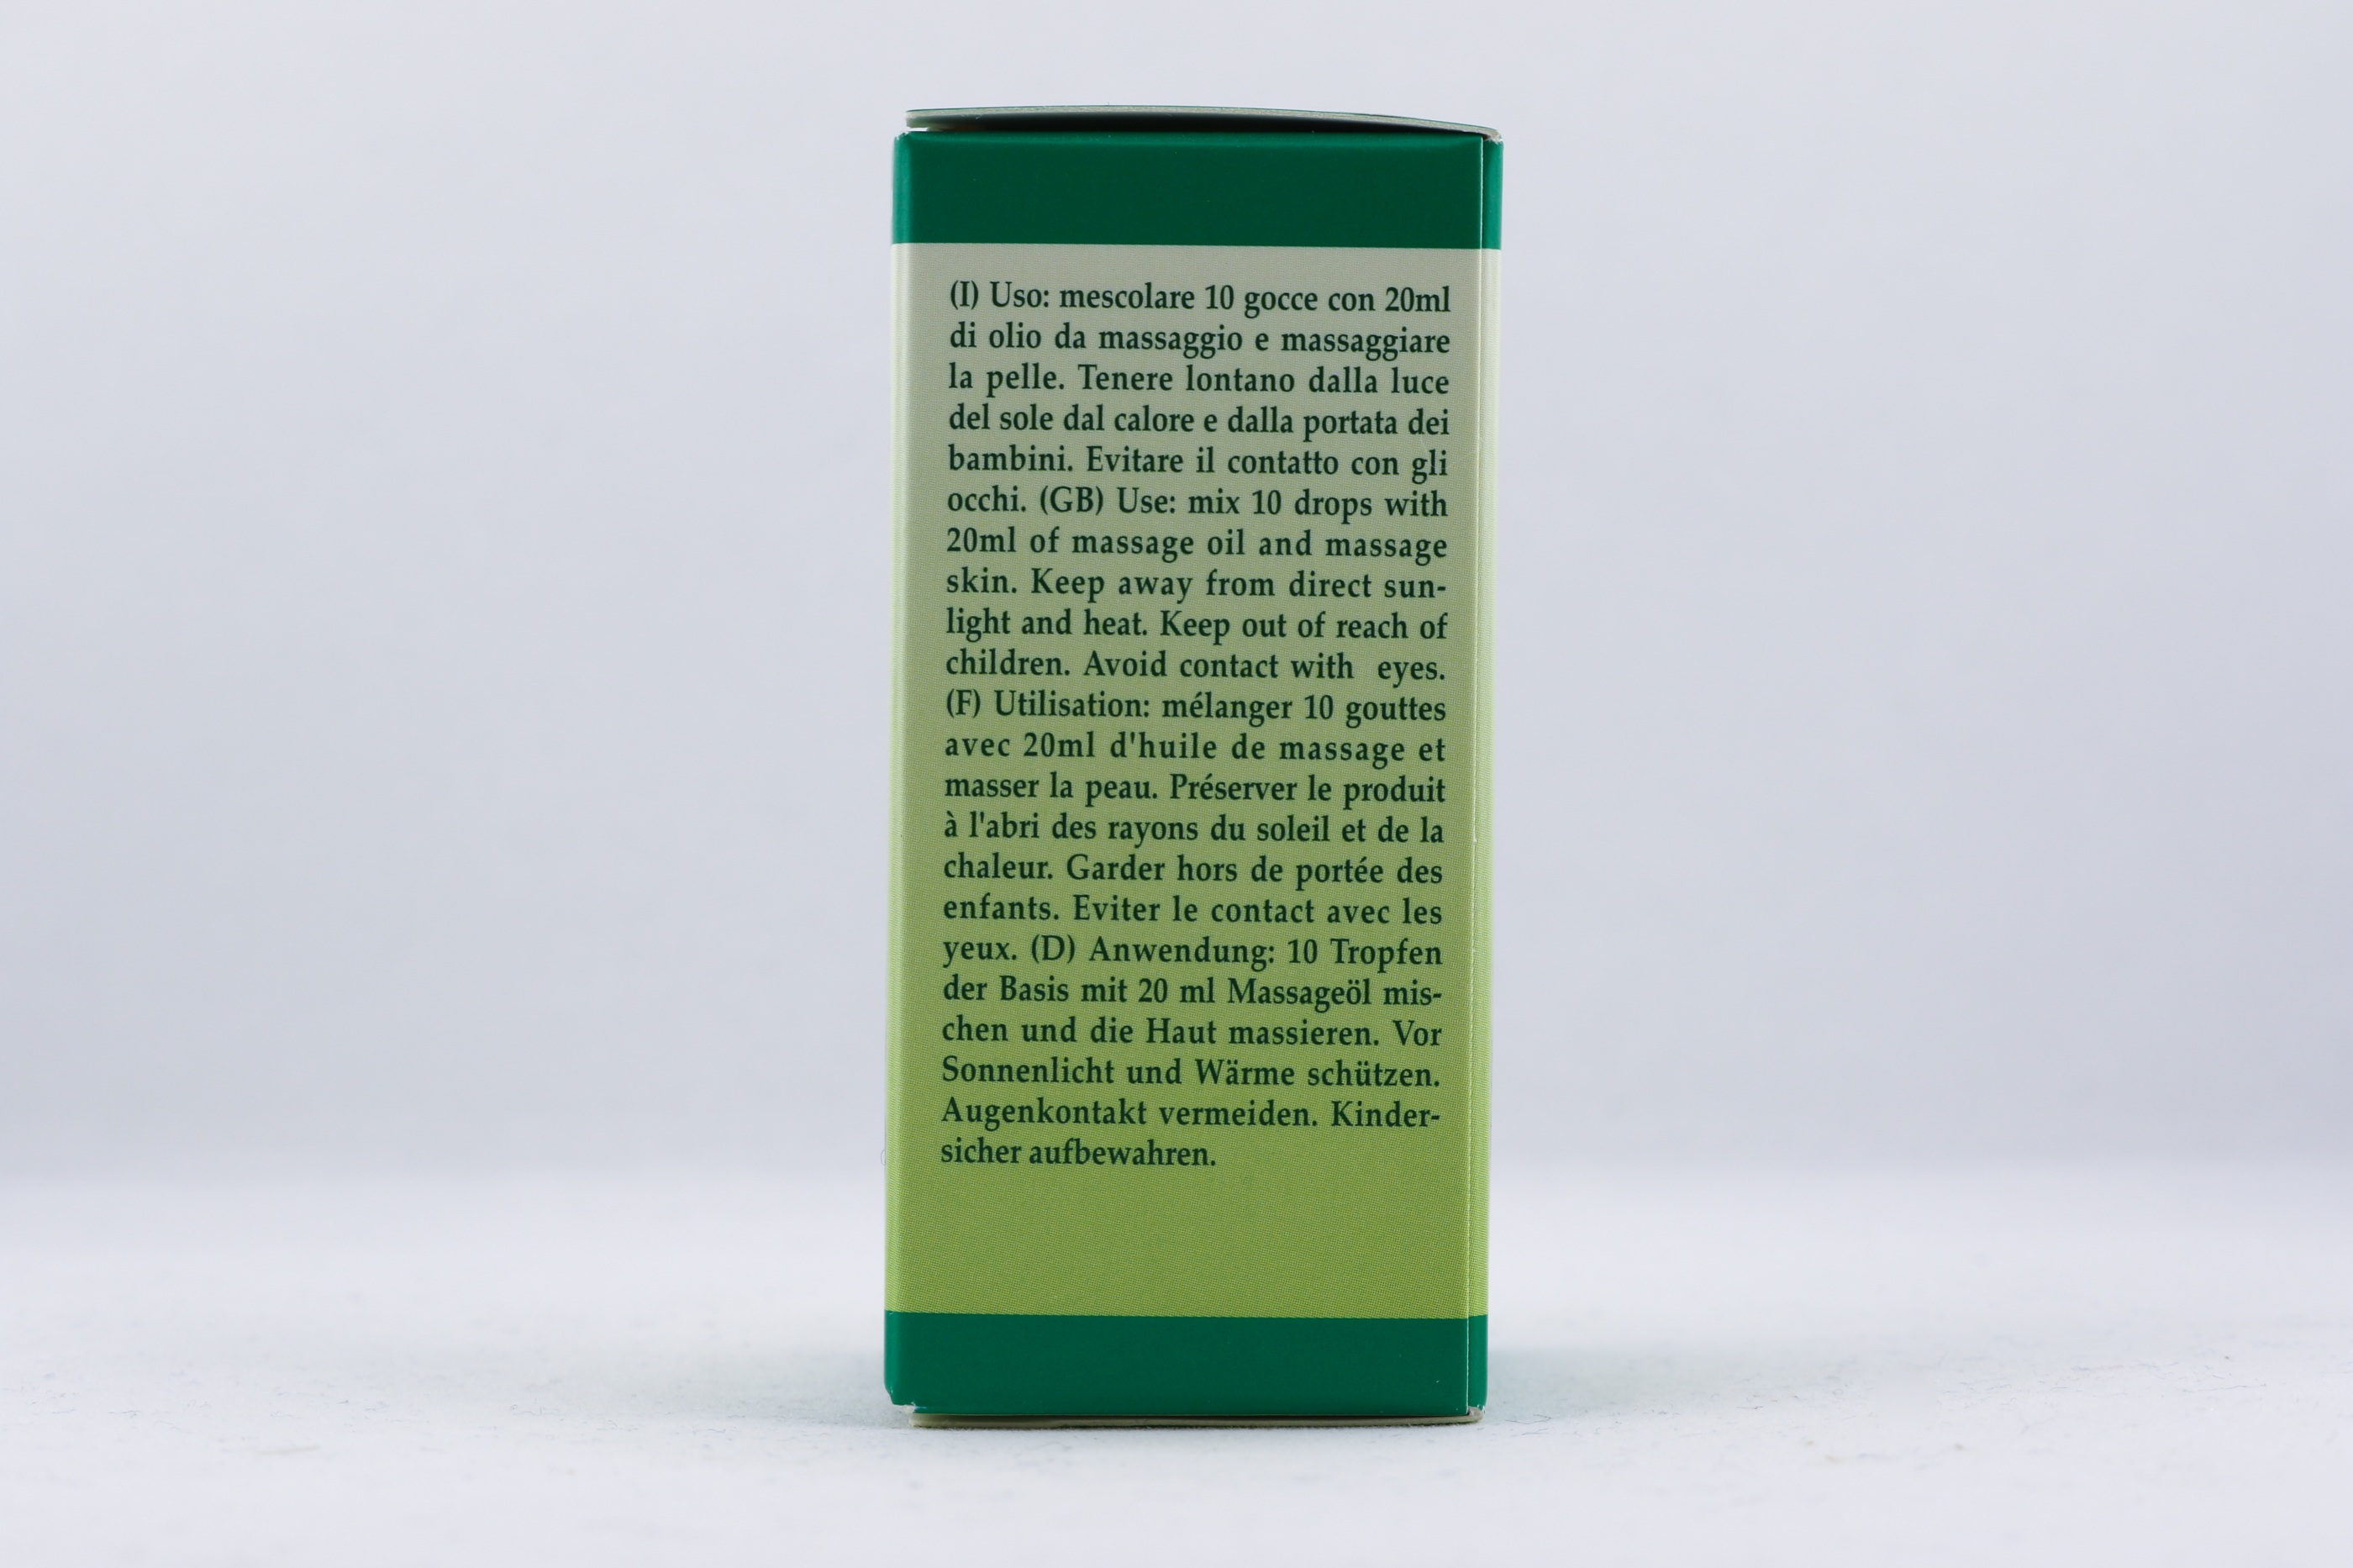 Benzoin olja wellness ayurveda halmstad sweden svensk eterisk aroma olja